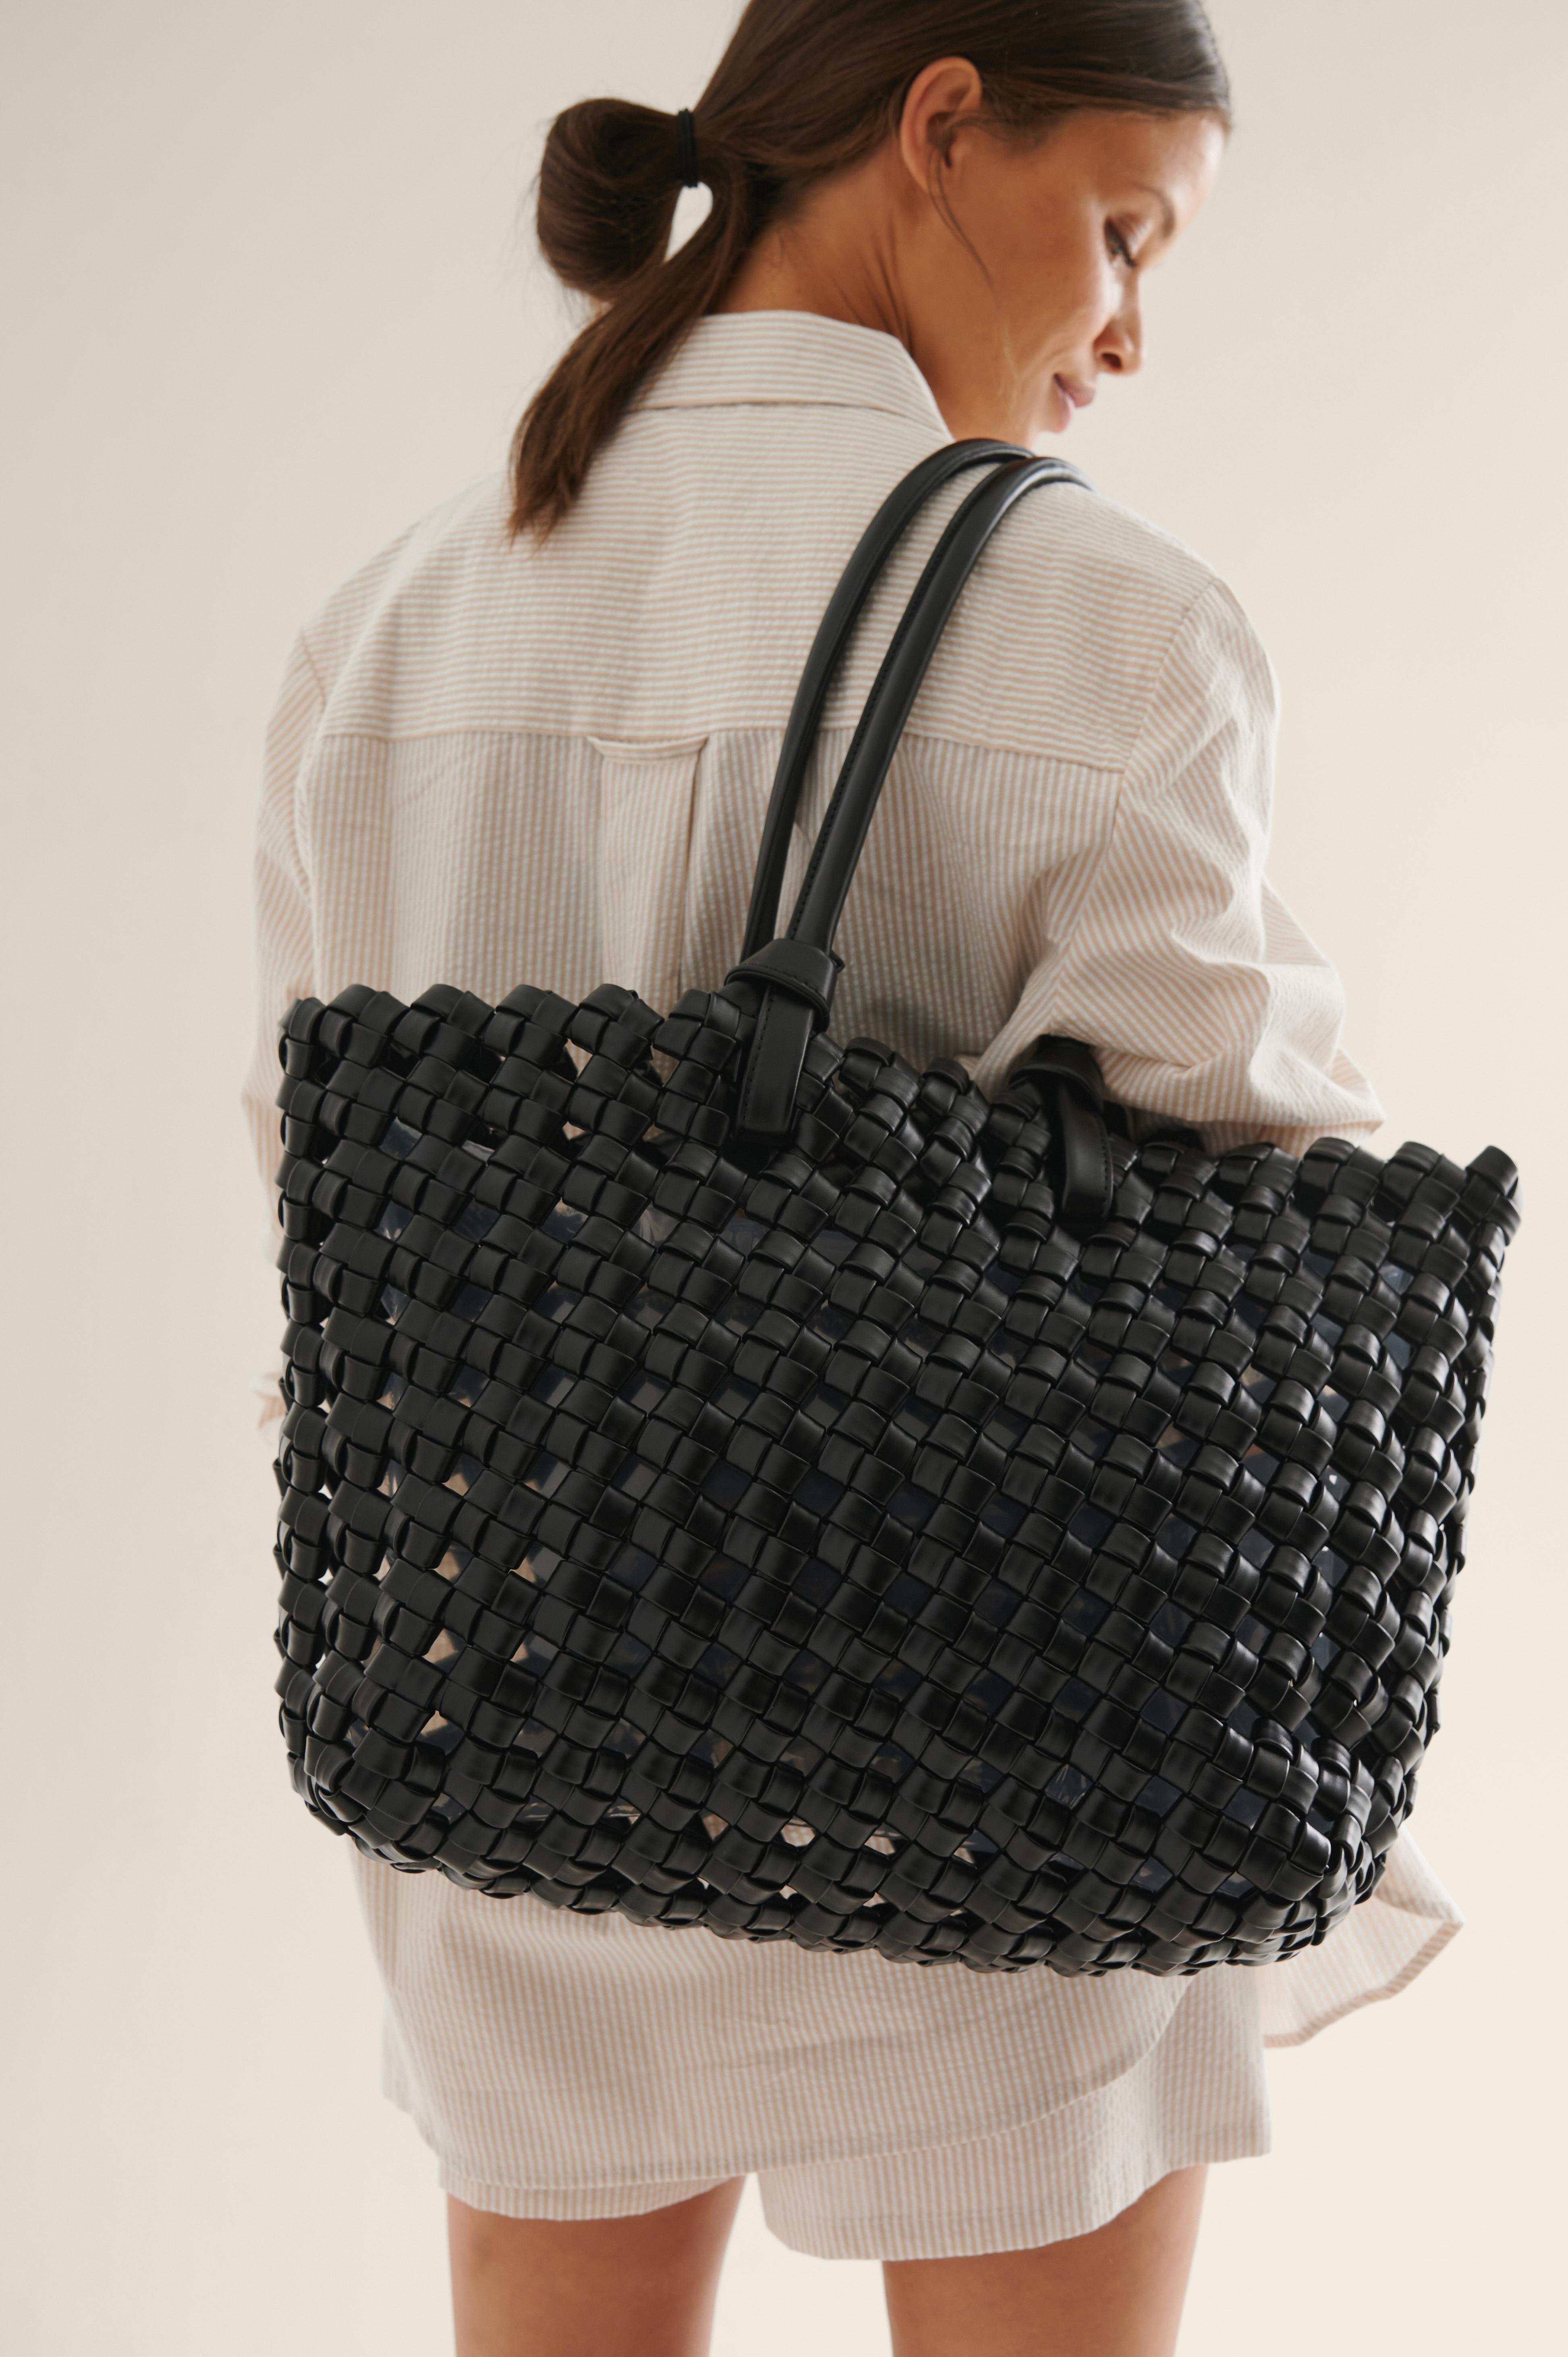 NA-KD Accessories Oversized Stor Flettet Shopper - Black